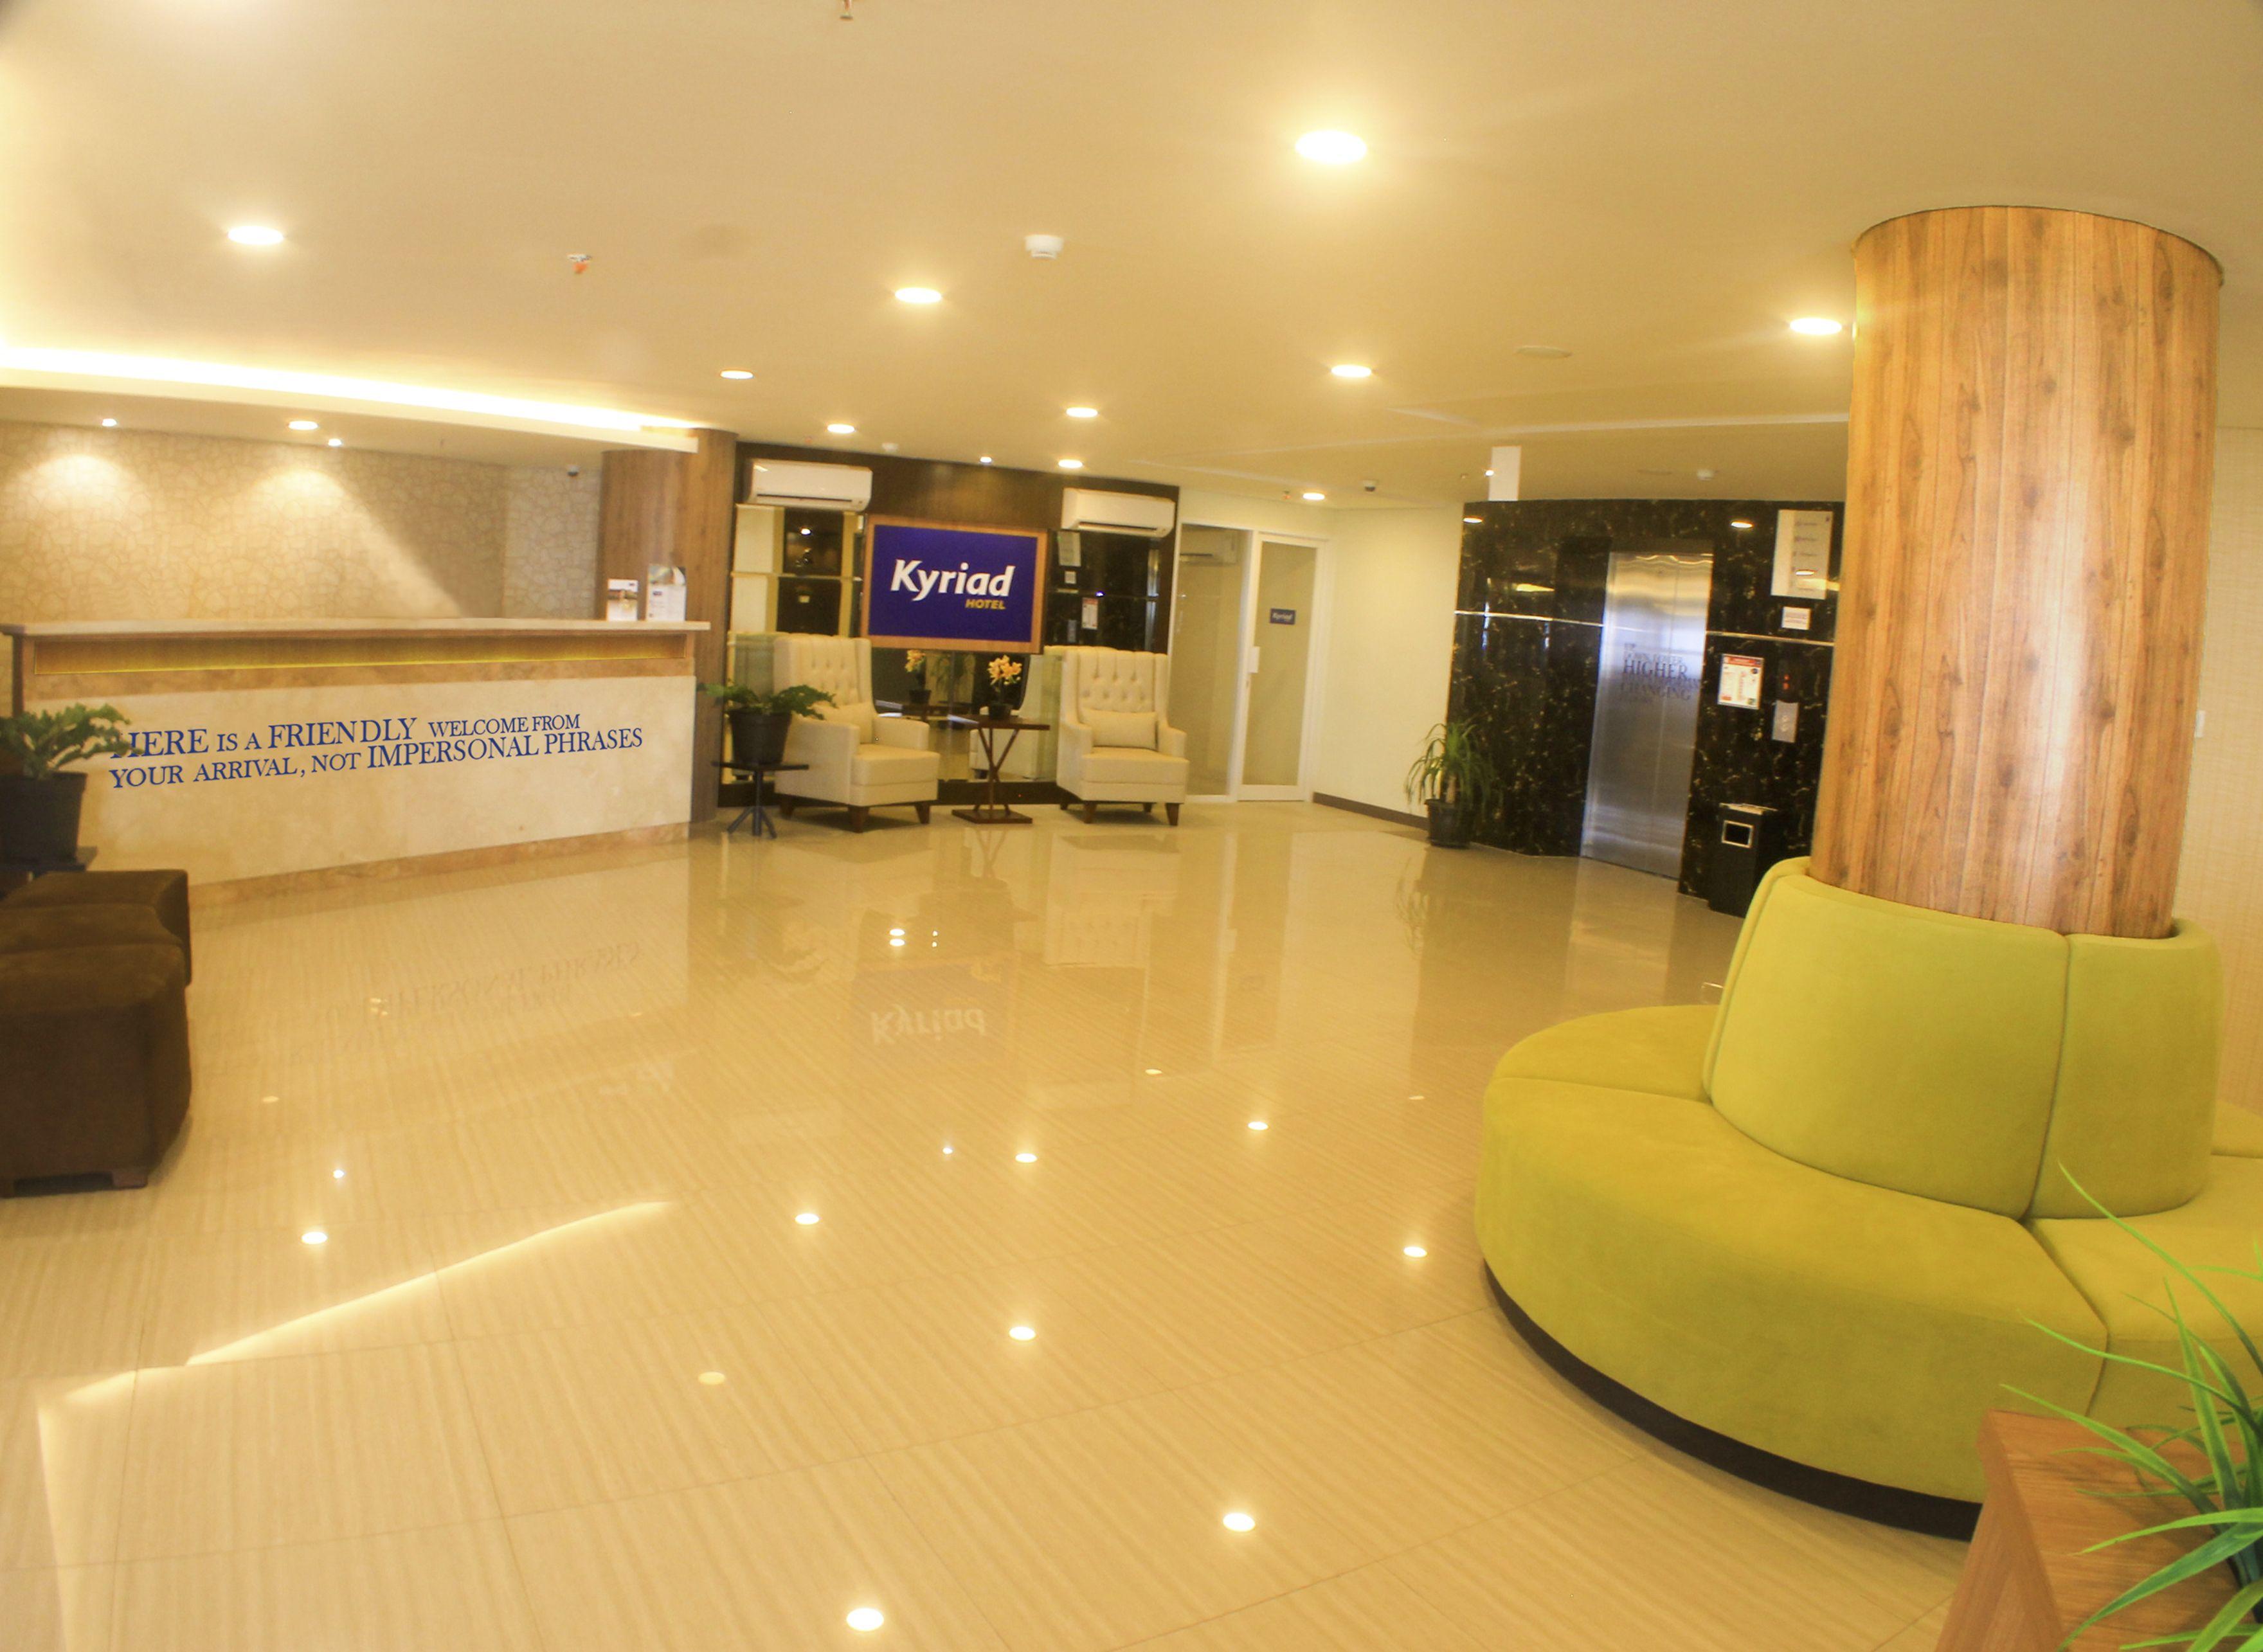 Kyriad Hotel Metro Cipulir Jakarta, Jakarta Selatan